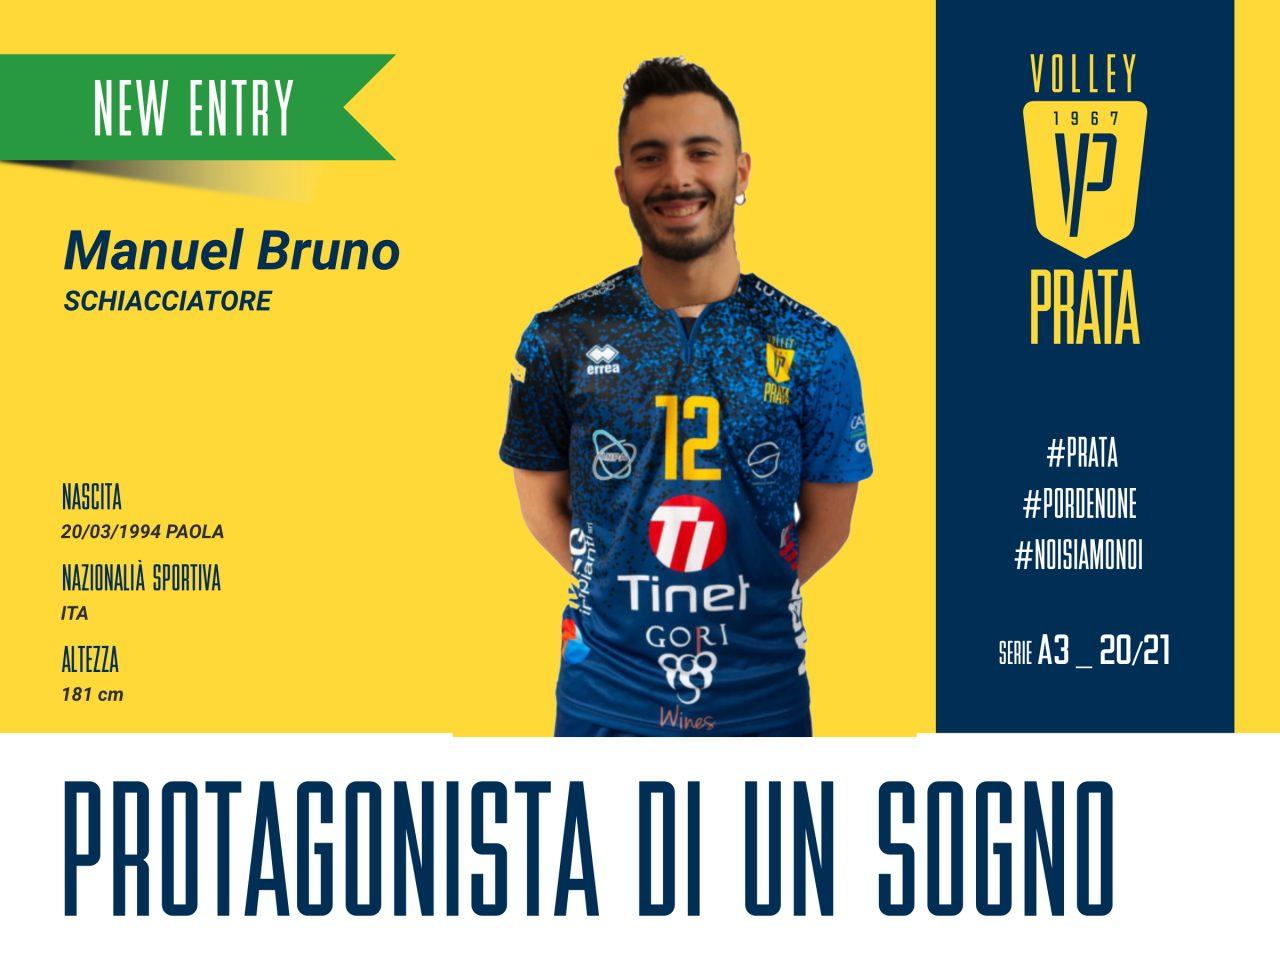 Annuncio-Bruno-1280x960.jpg